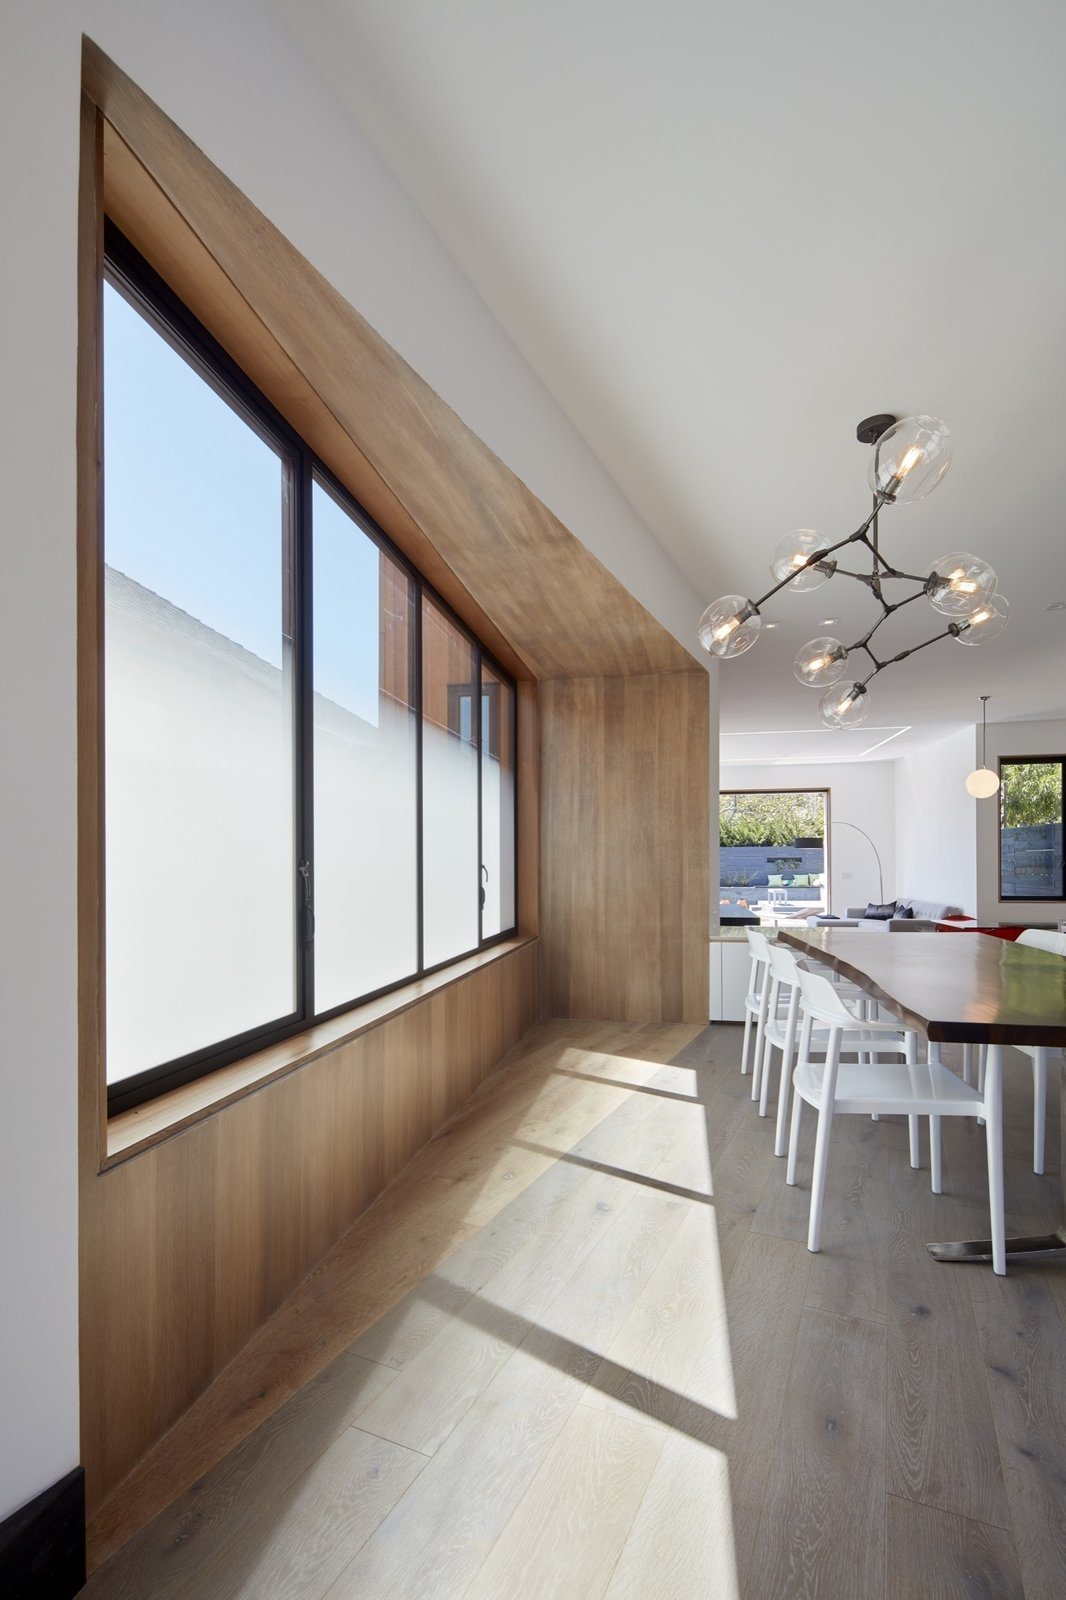 Dining Room, Chair, Pendant Lighting, Table, Accent Lighting, and Light Hardwood Floor  Noe Valley House